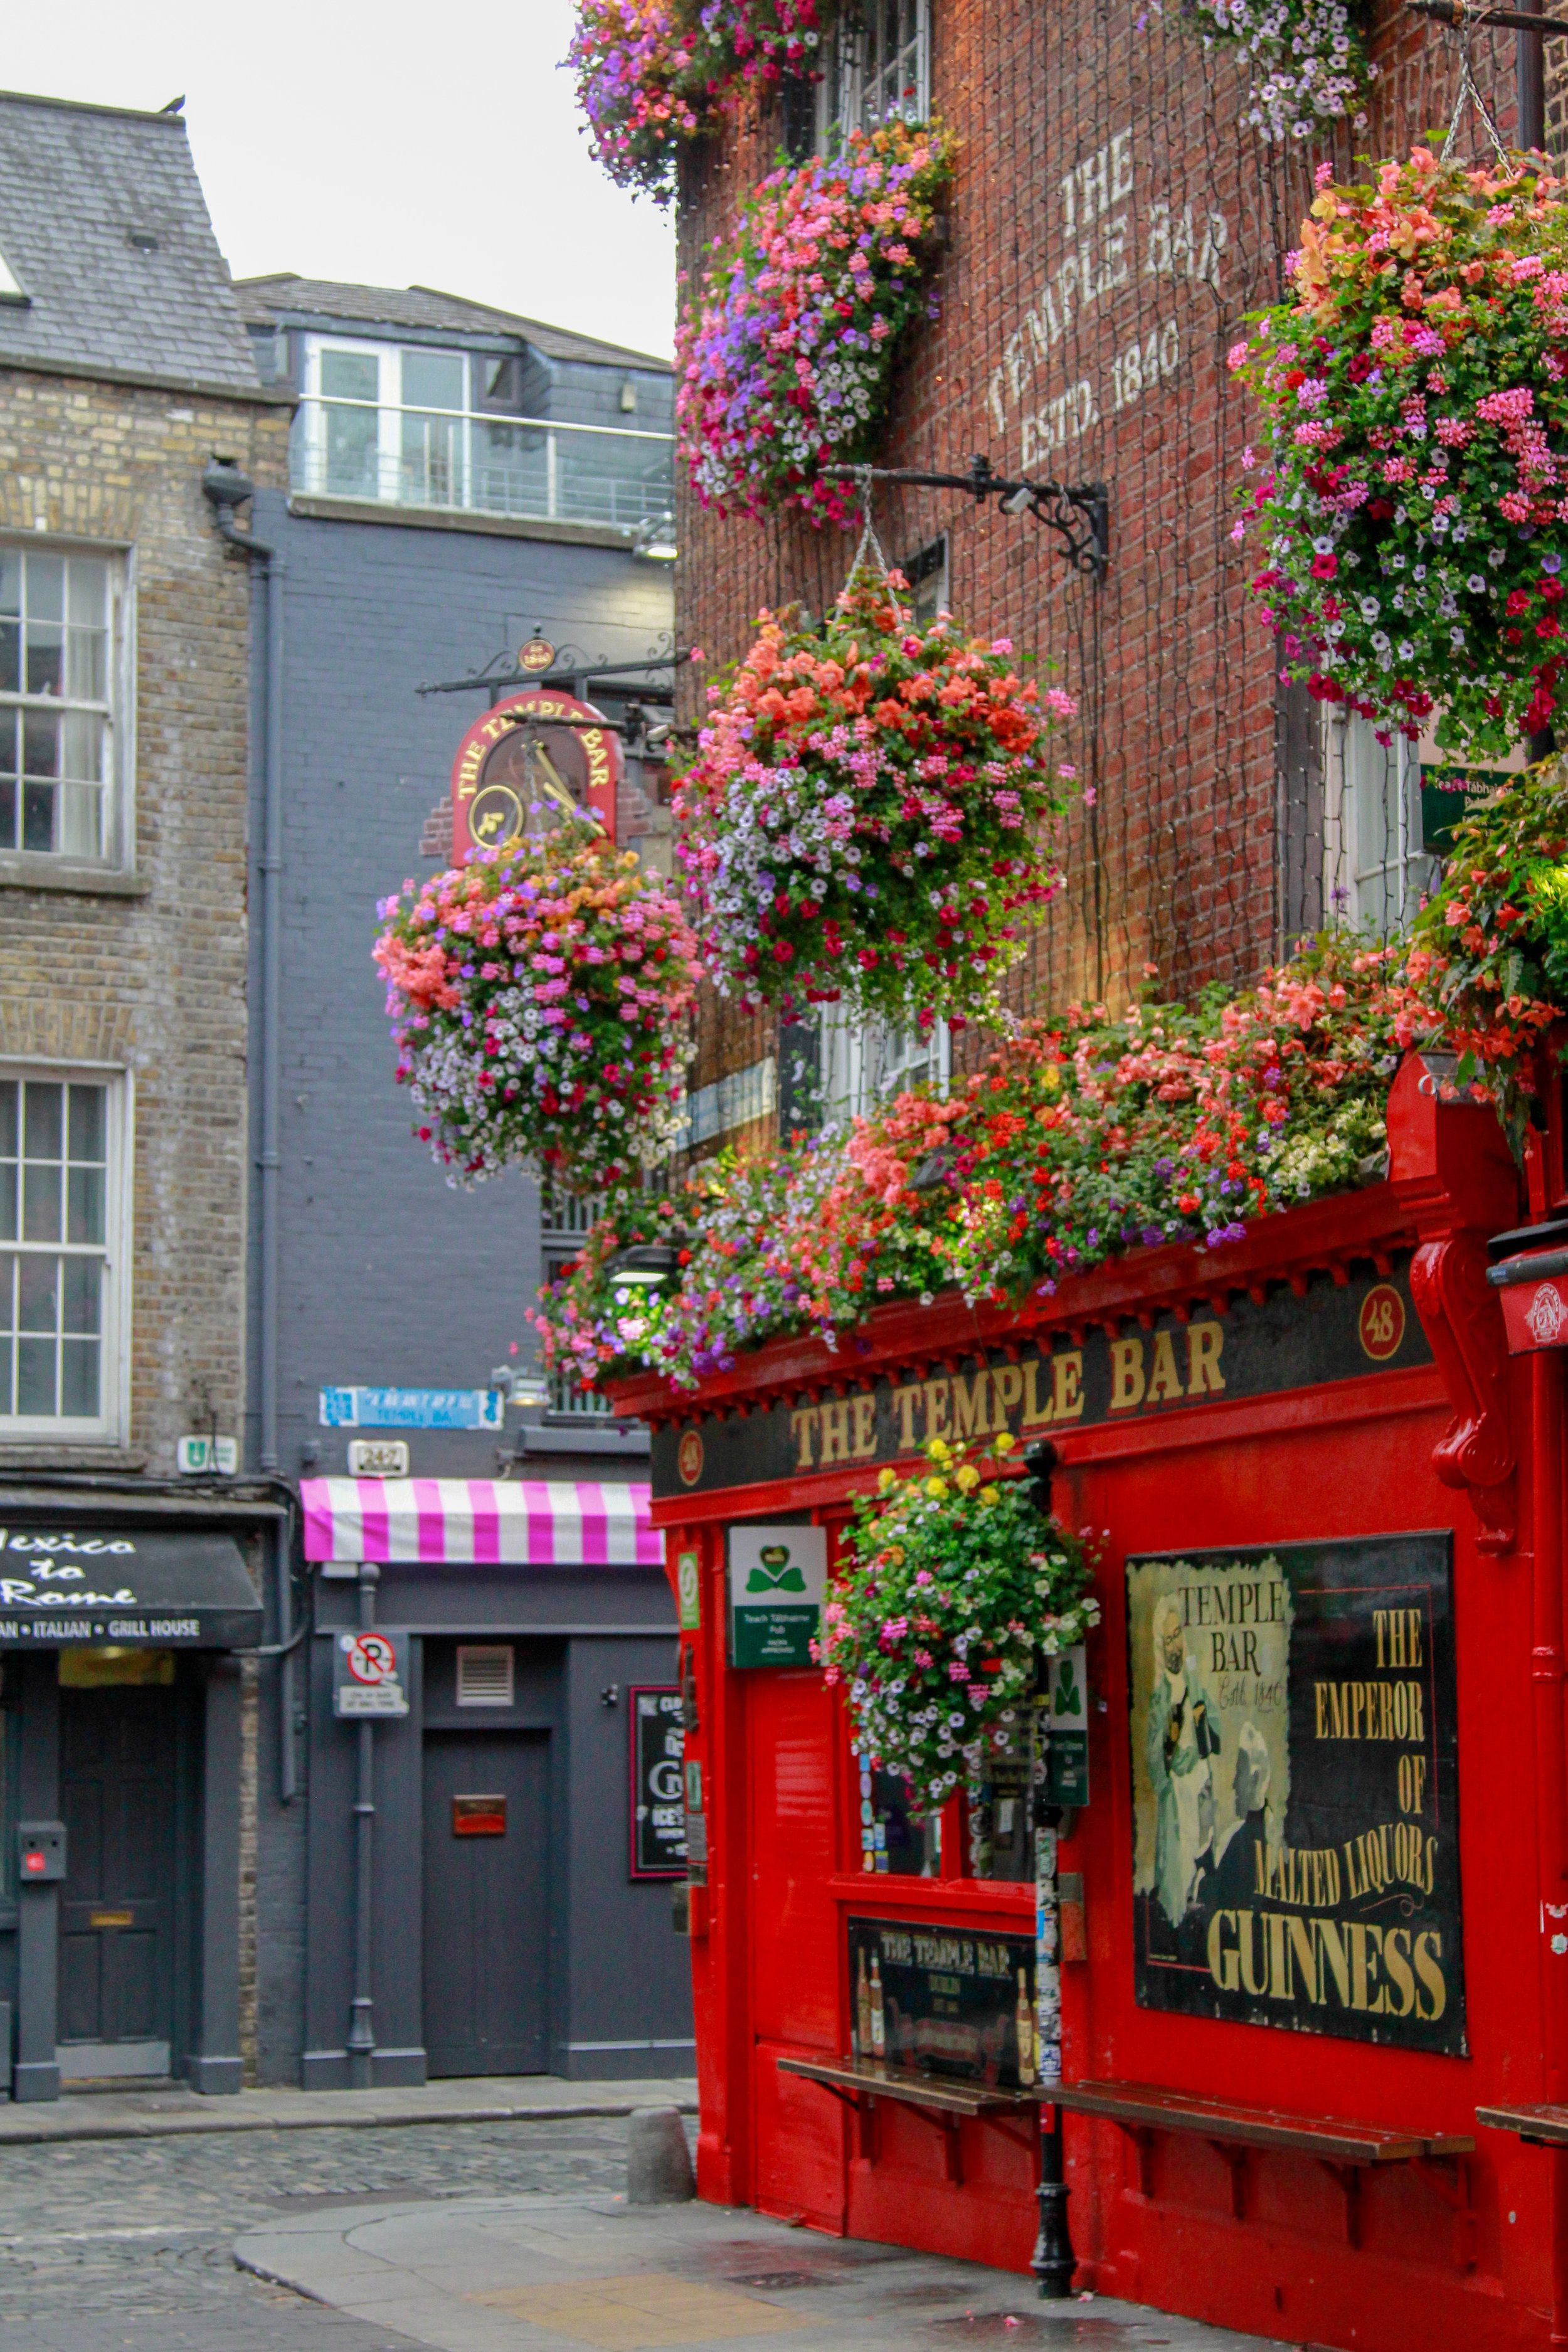 Temple Bar, Dublin - Guide to Dublin